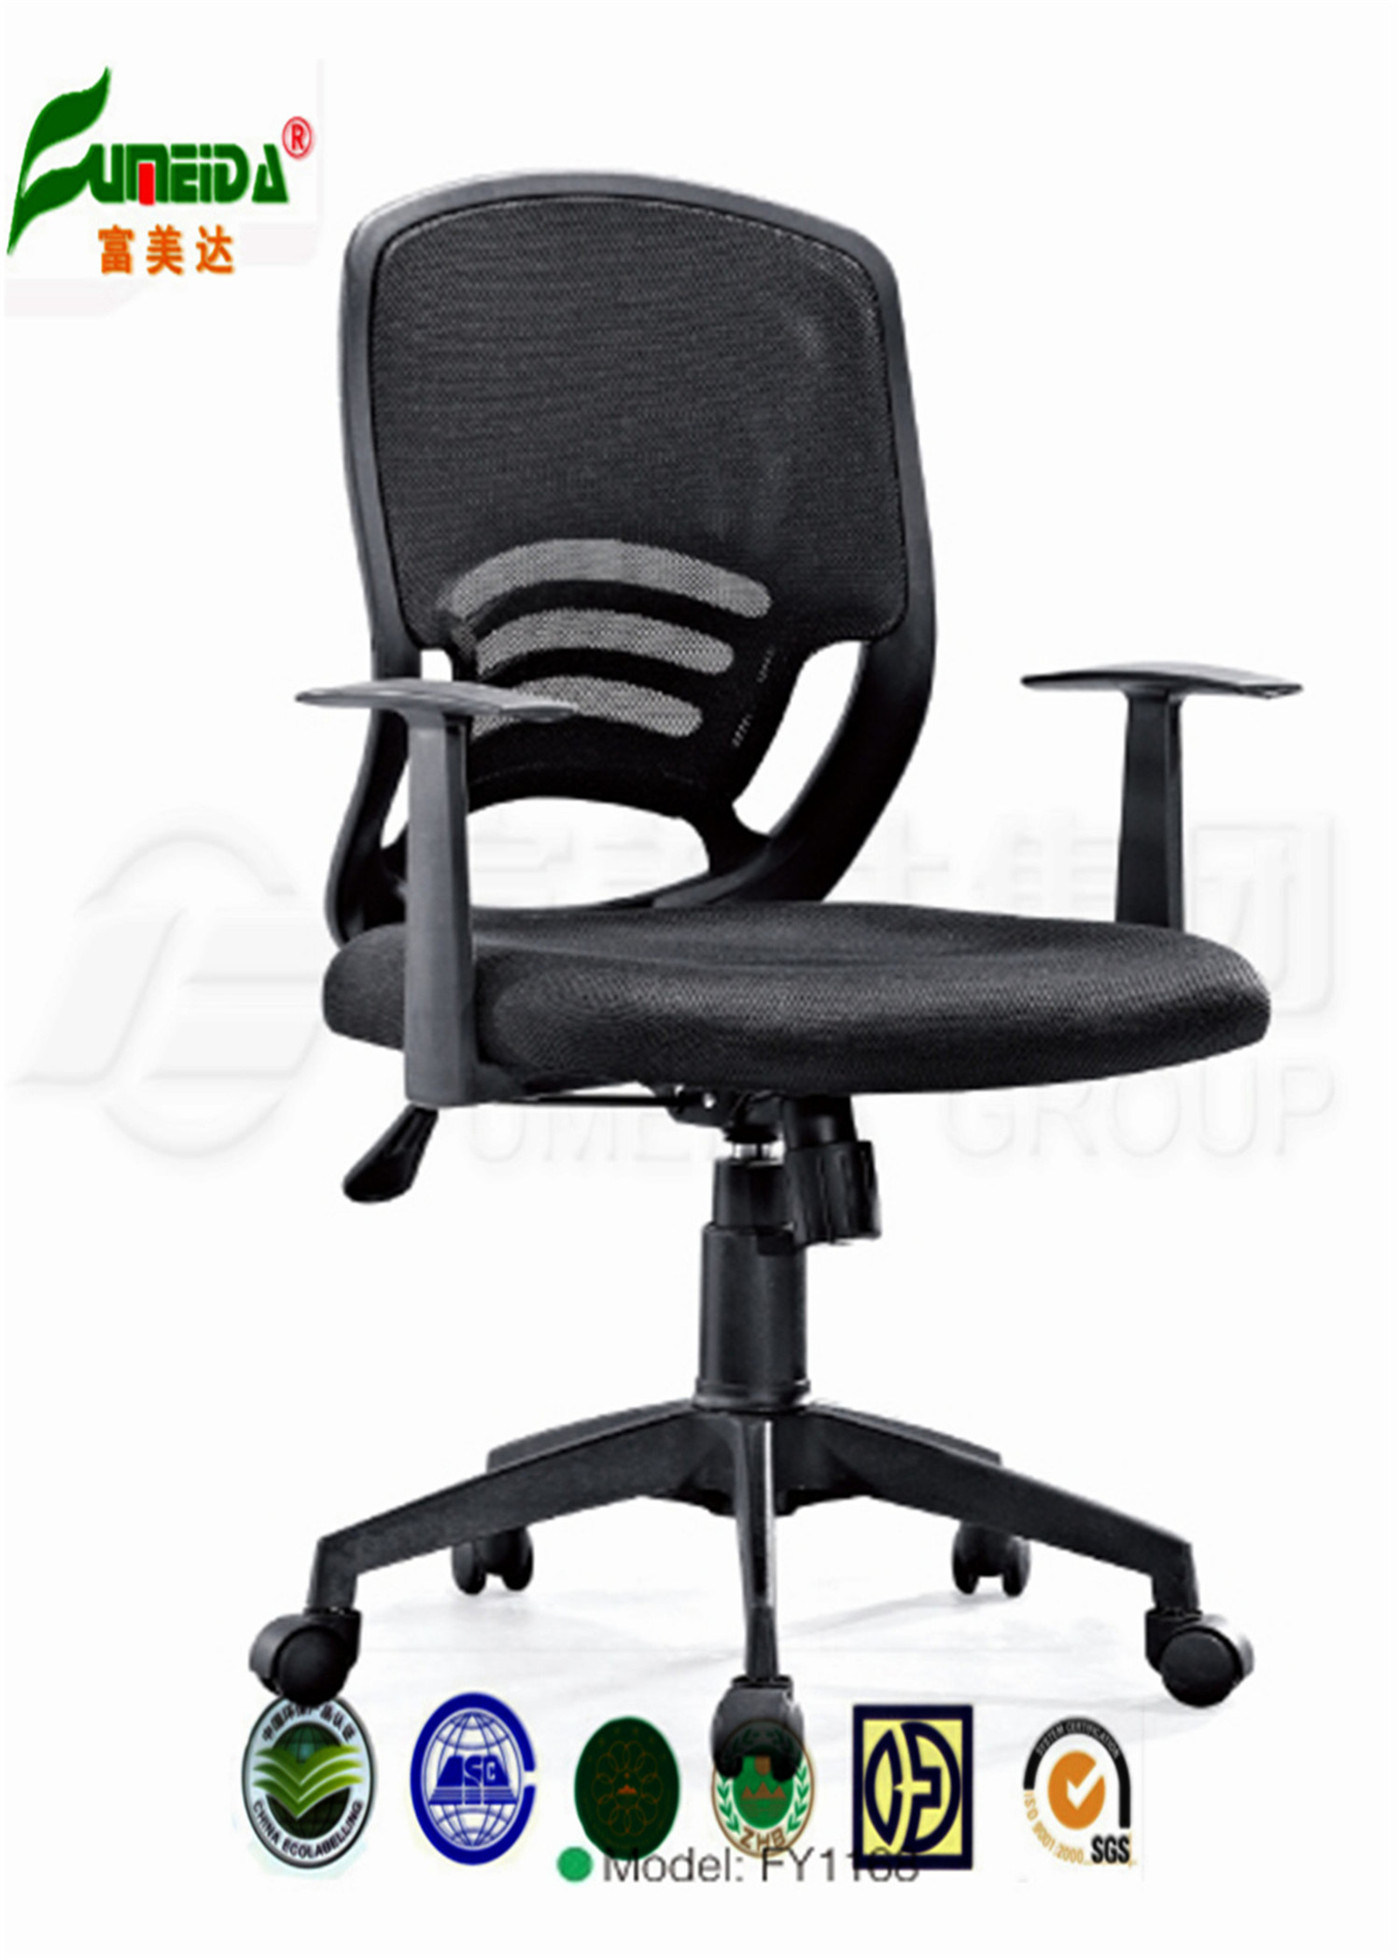 China staff chair office furniture ergonomic swivel mesh office chair fy1168 china office chair chair